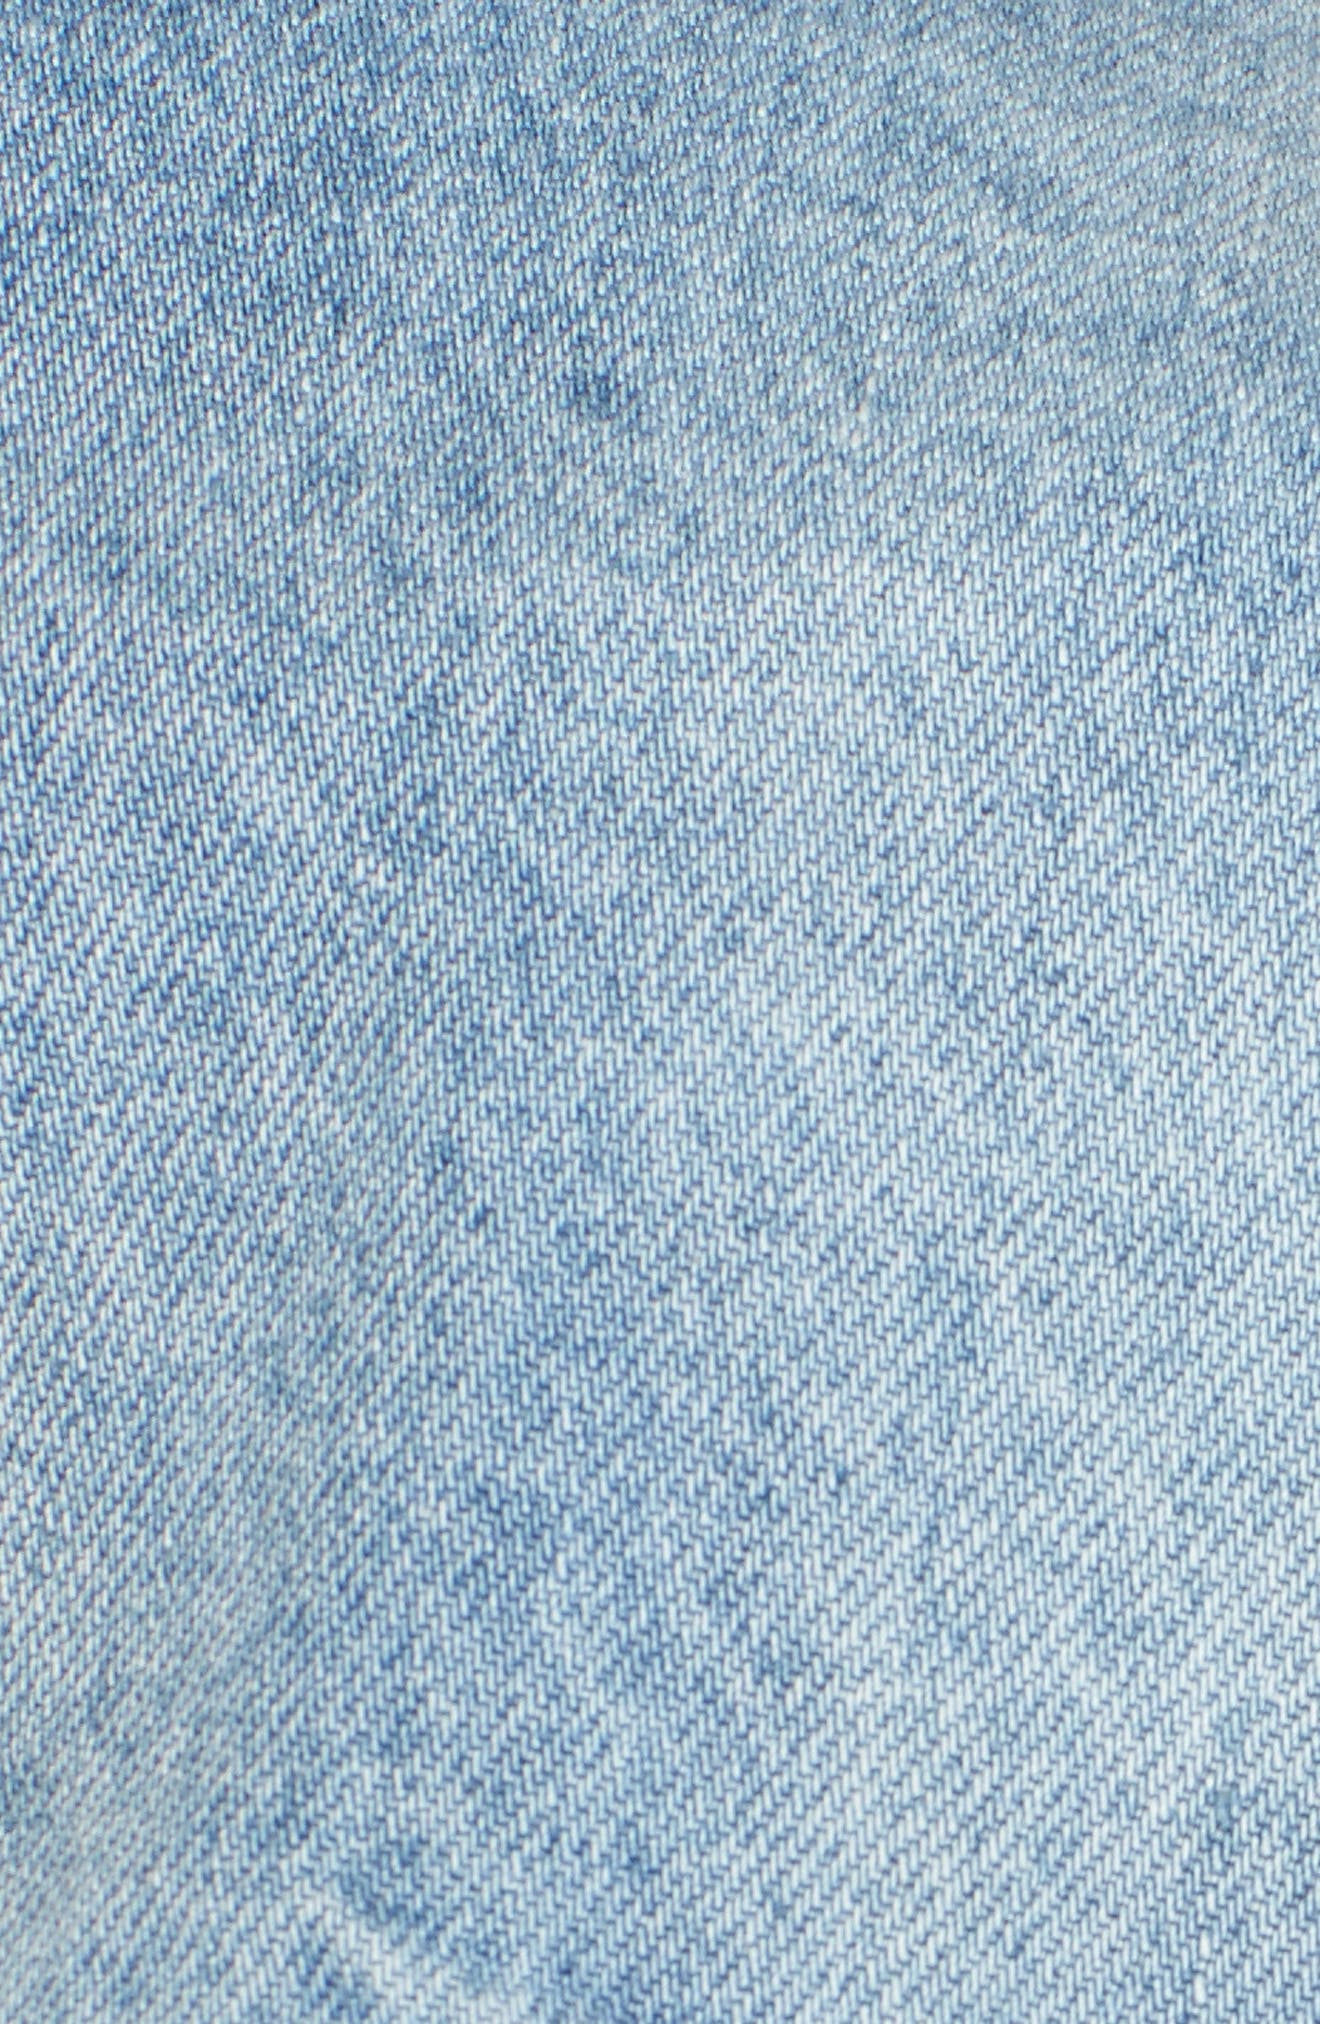 Embellished Ripped Denim Jacket,                             Alternate thumbnail 6, color,                             430